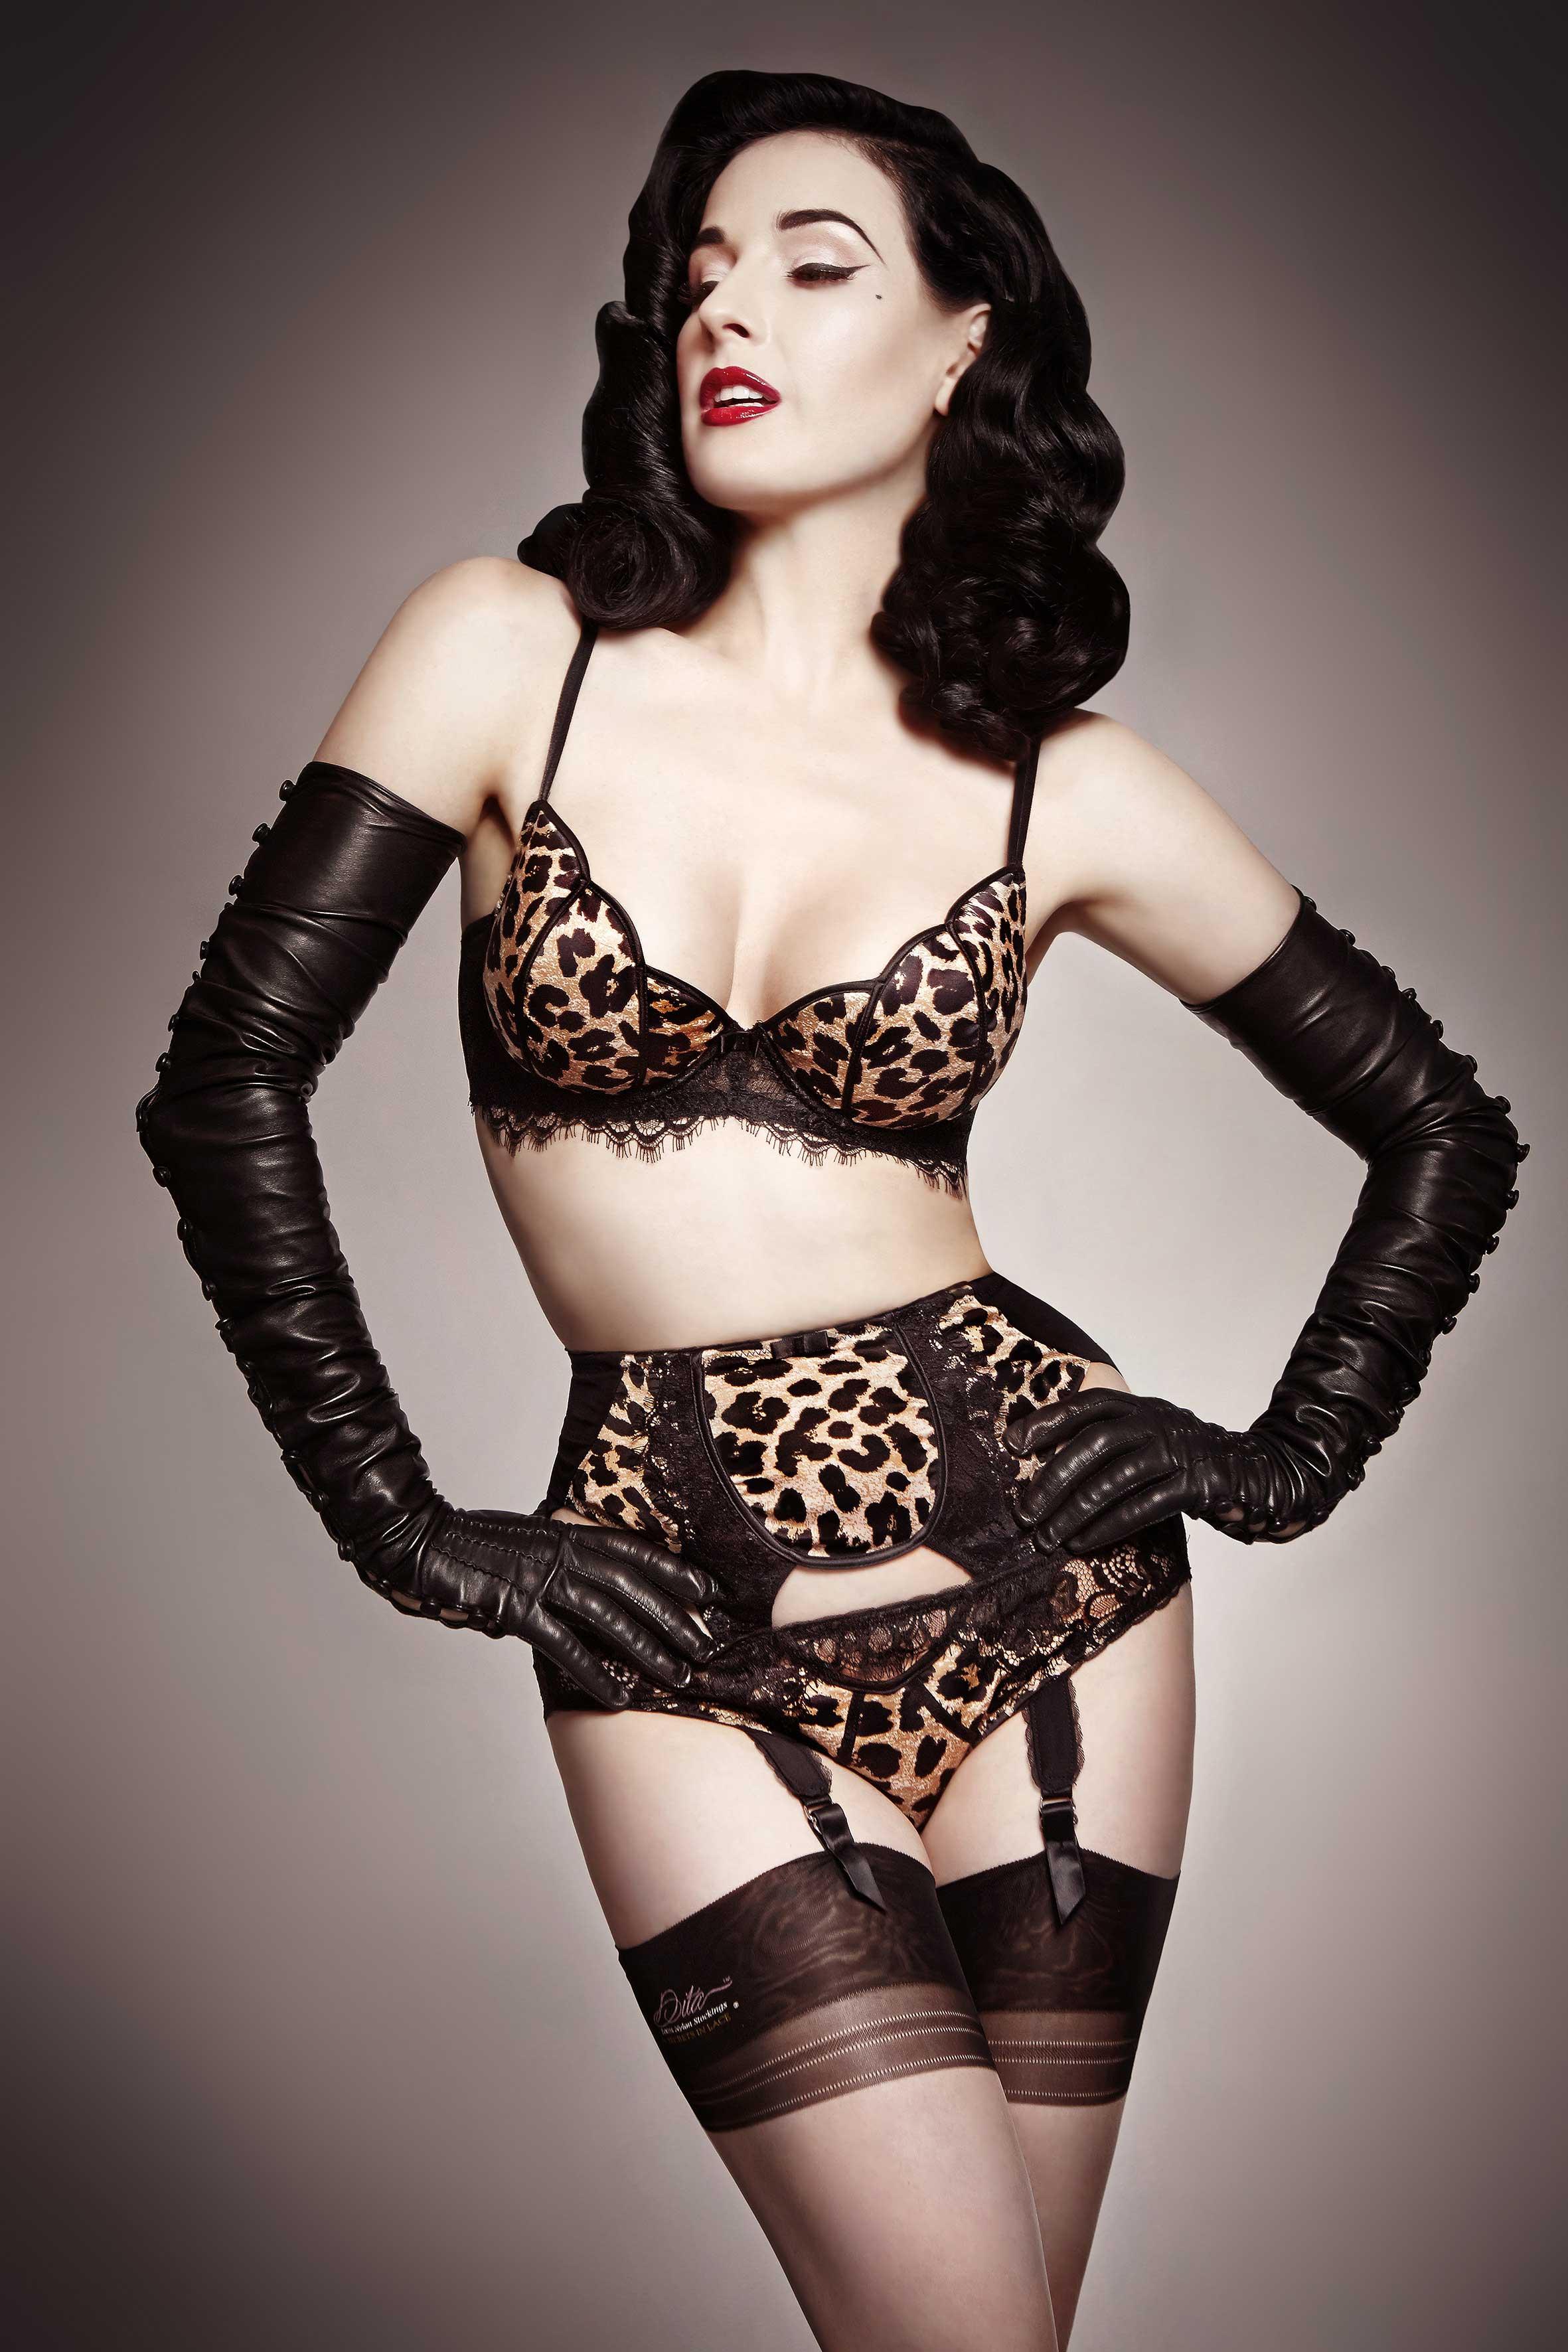 277058_Dita_Von_Teese_lingerie_tulip_cheetah_lookbook